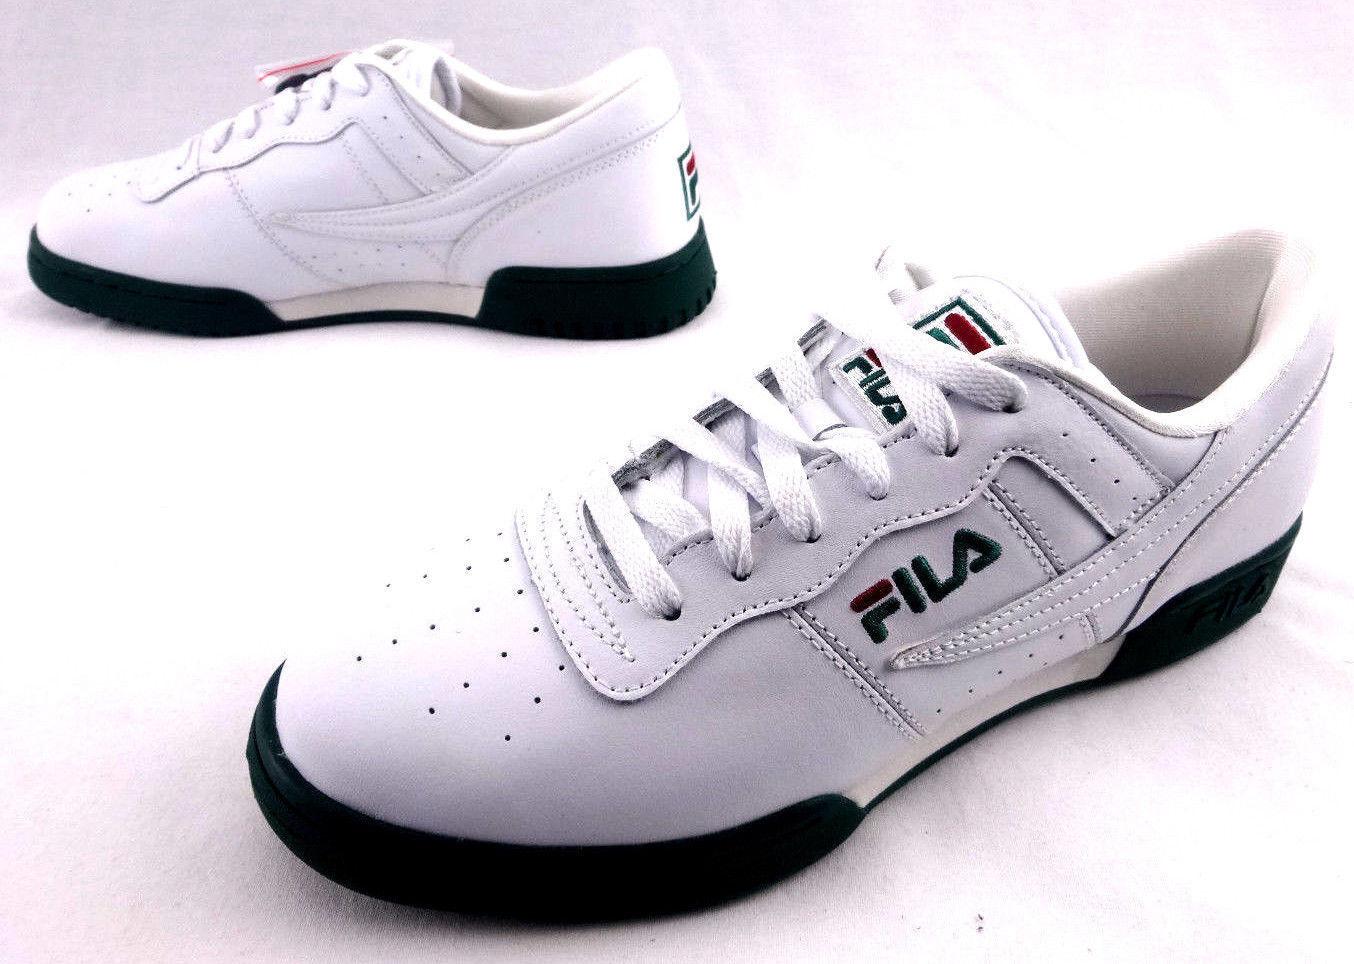 Fila Retro Heritage Original Fitness shoes 1VF80016-124 New USA Men's Size 9.5